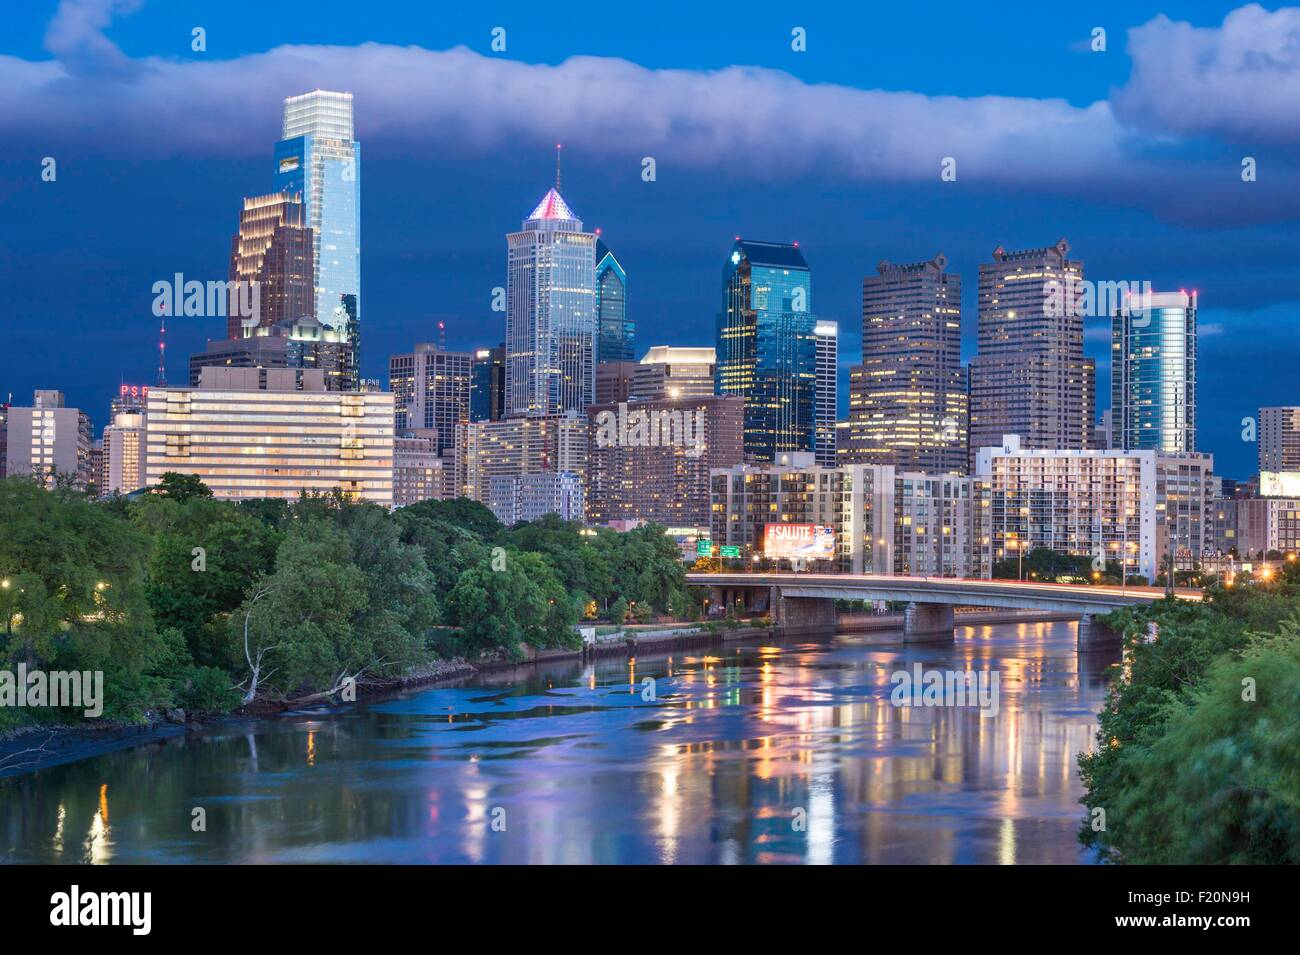 United States, Pennsylvania, Philadelphia, cityskape Photo Stock